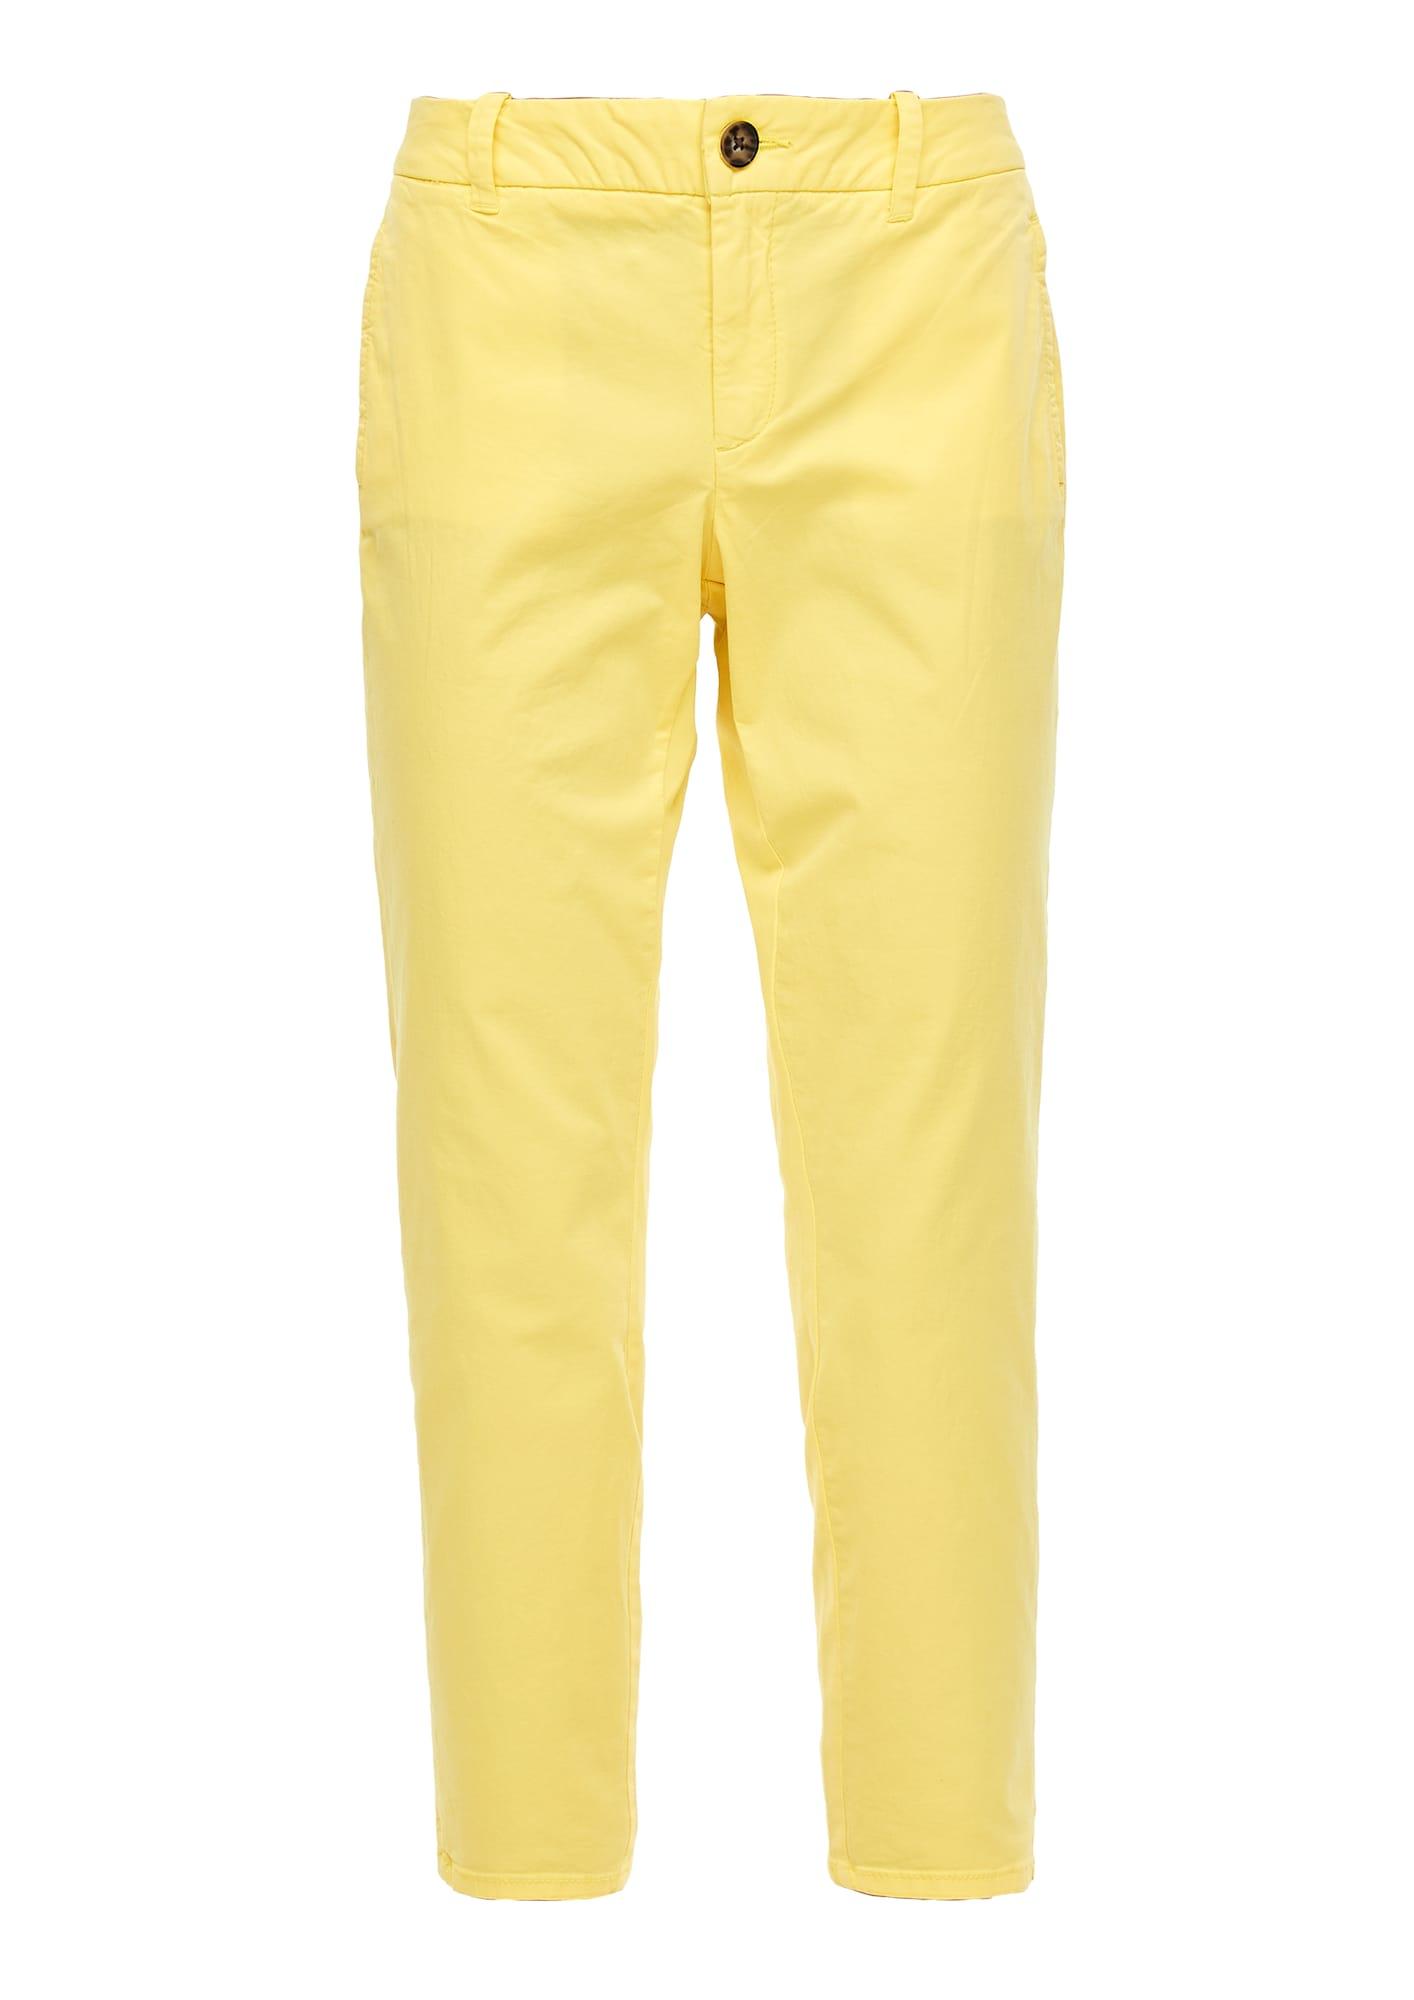 s.Oliver Chino nohavice  žlté